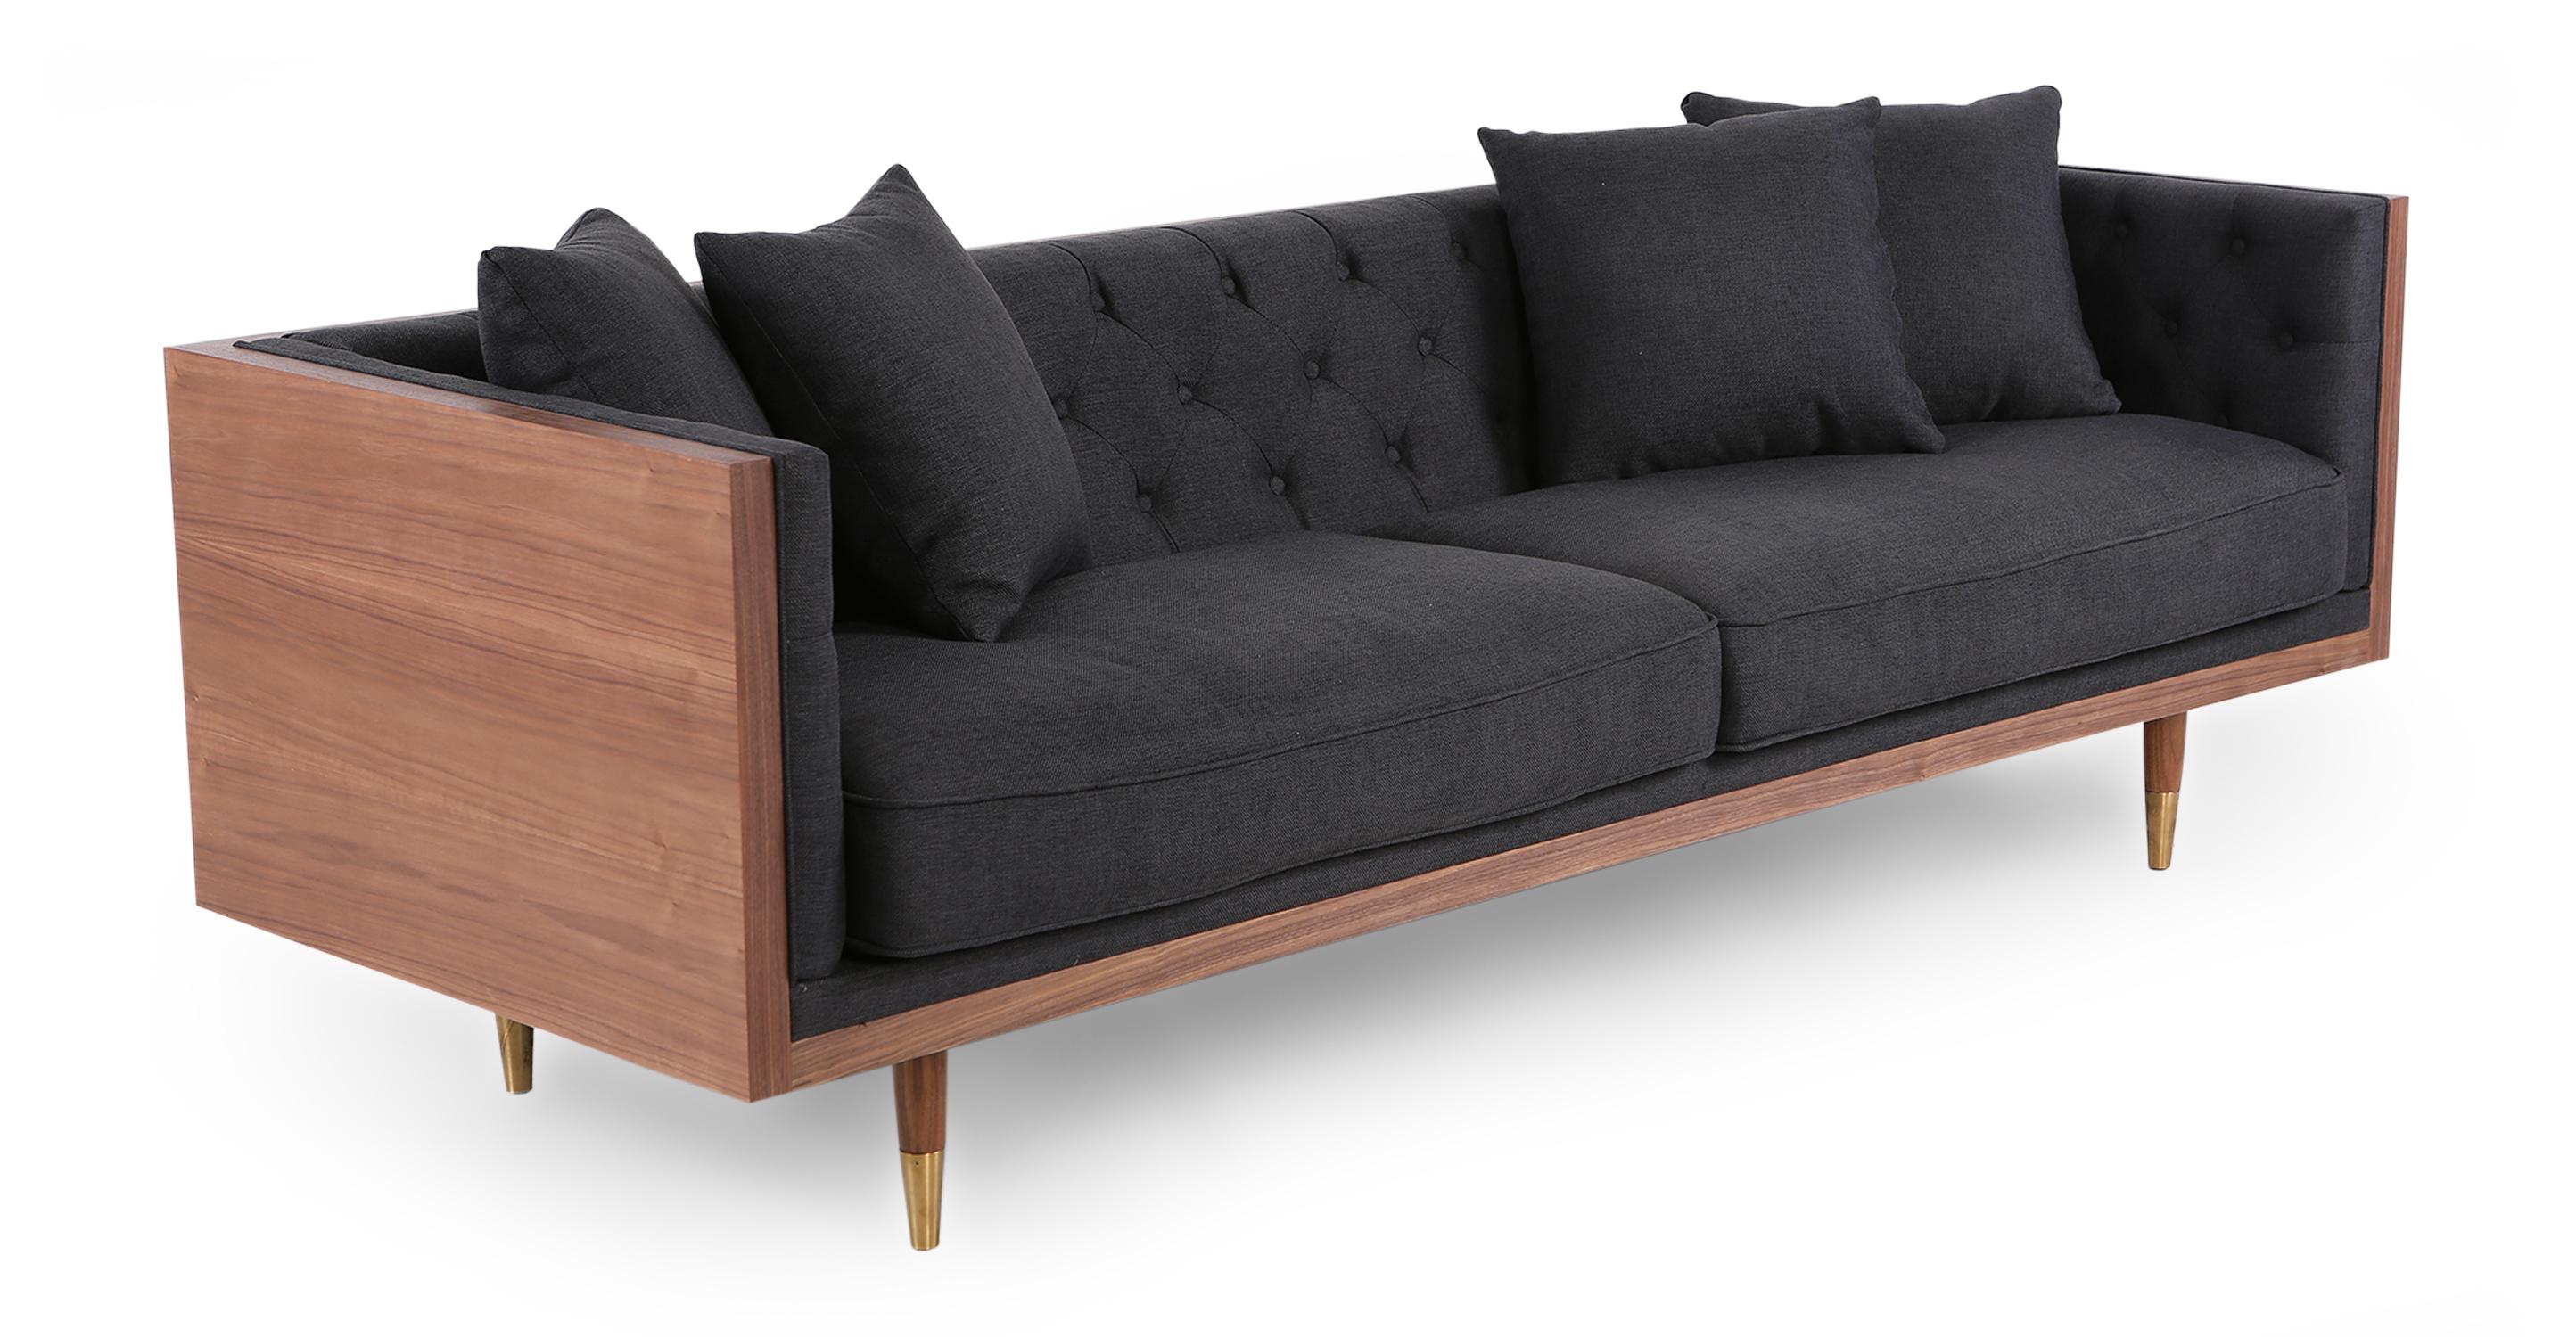 "Woodrow Neo 87"" Fabric Sofa, Walnut/Urban Ink"